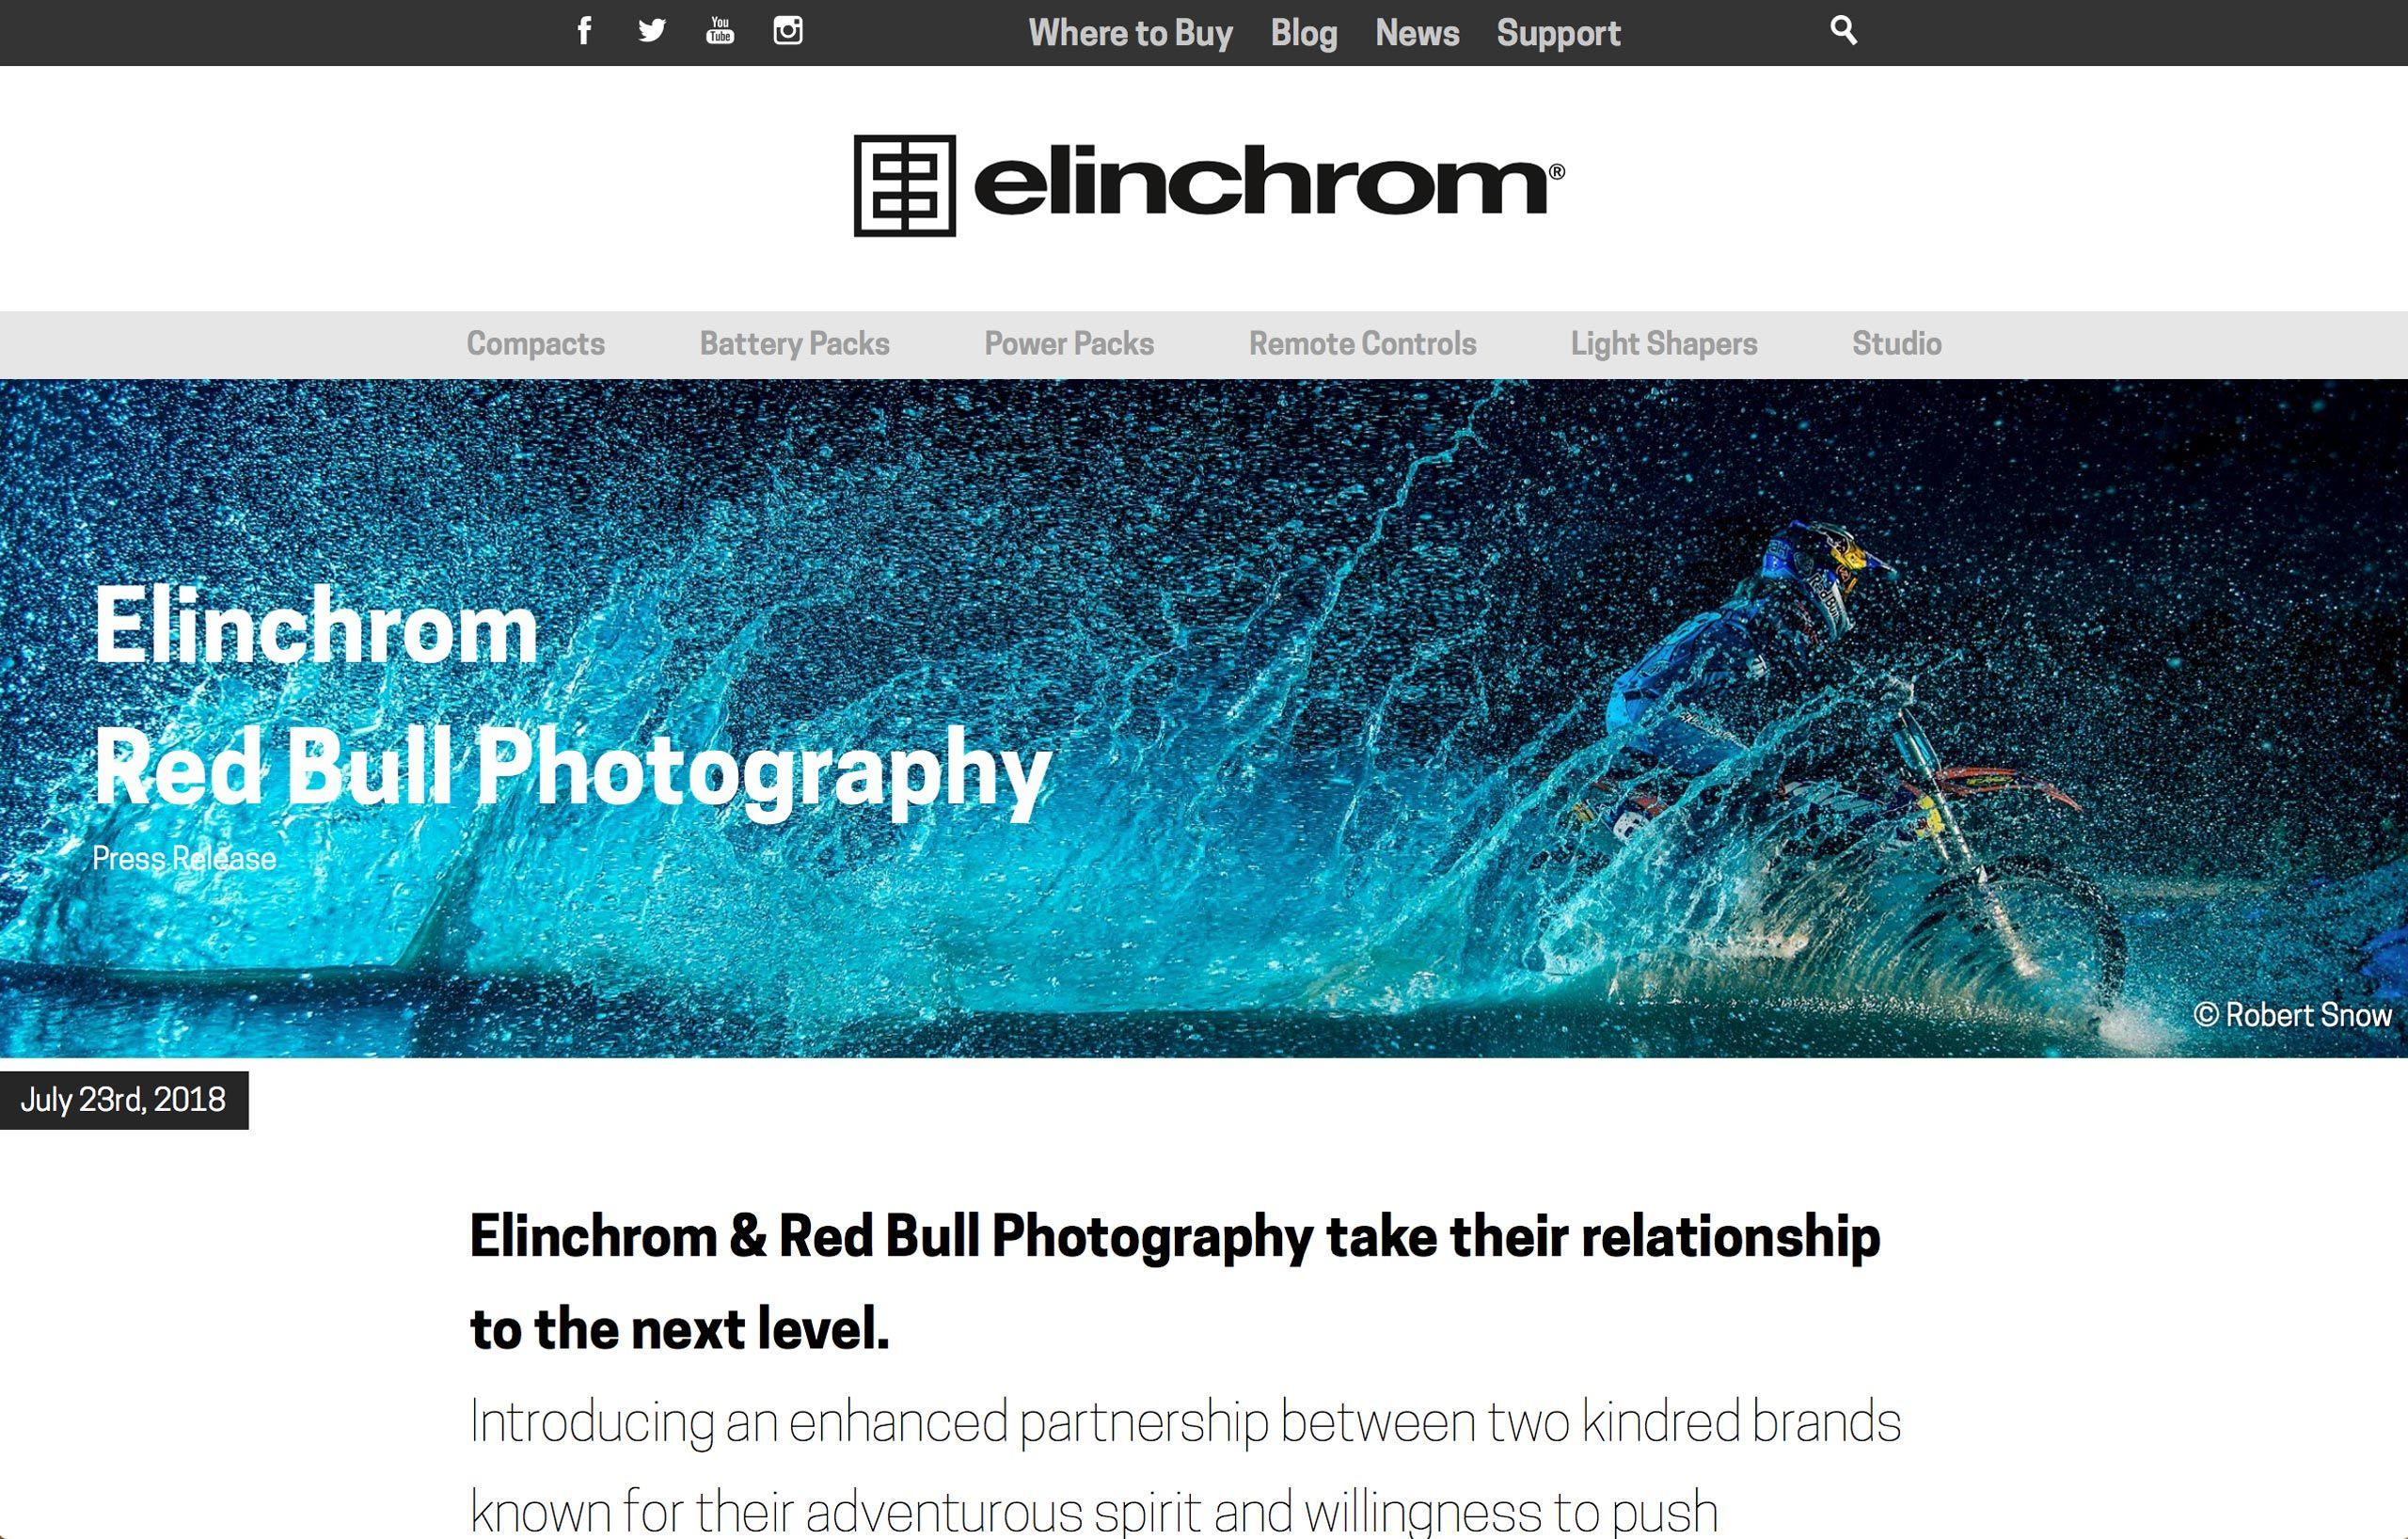 Elinchrom Tear Sheet - Advertising Photography in Orlando, Florida